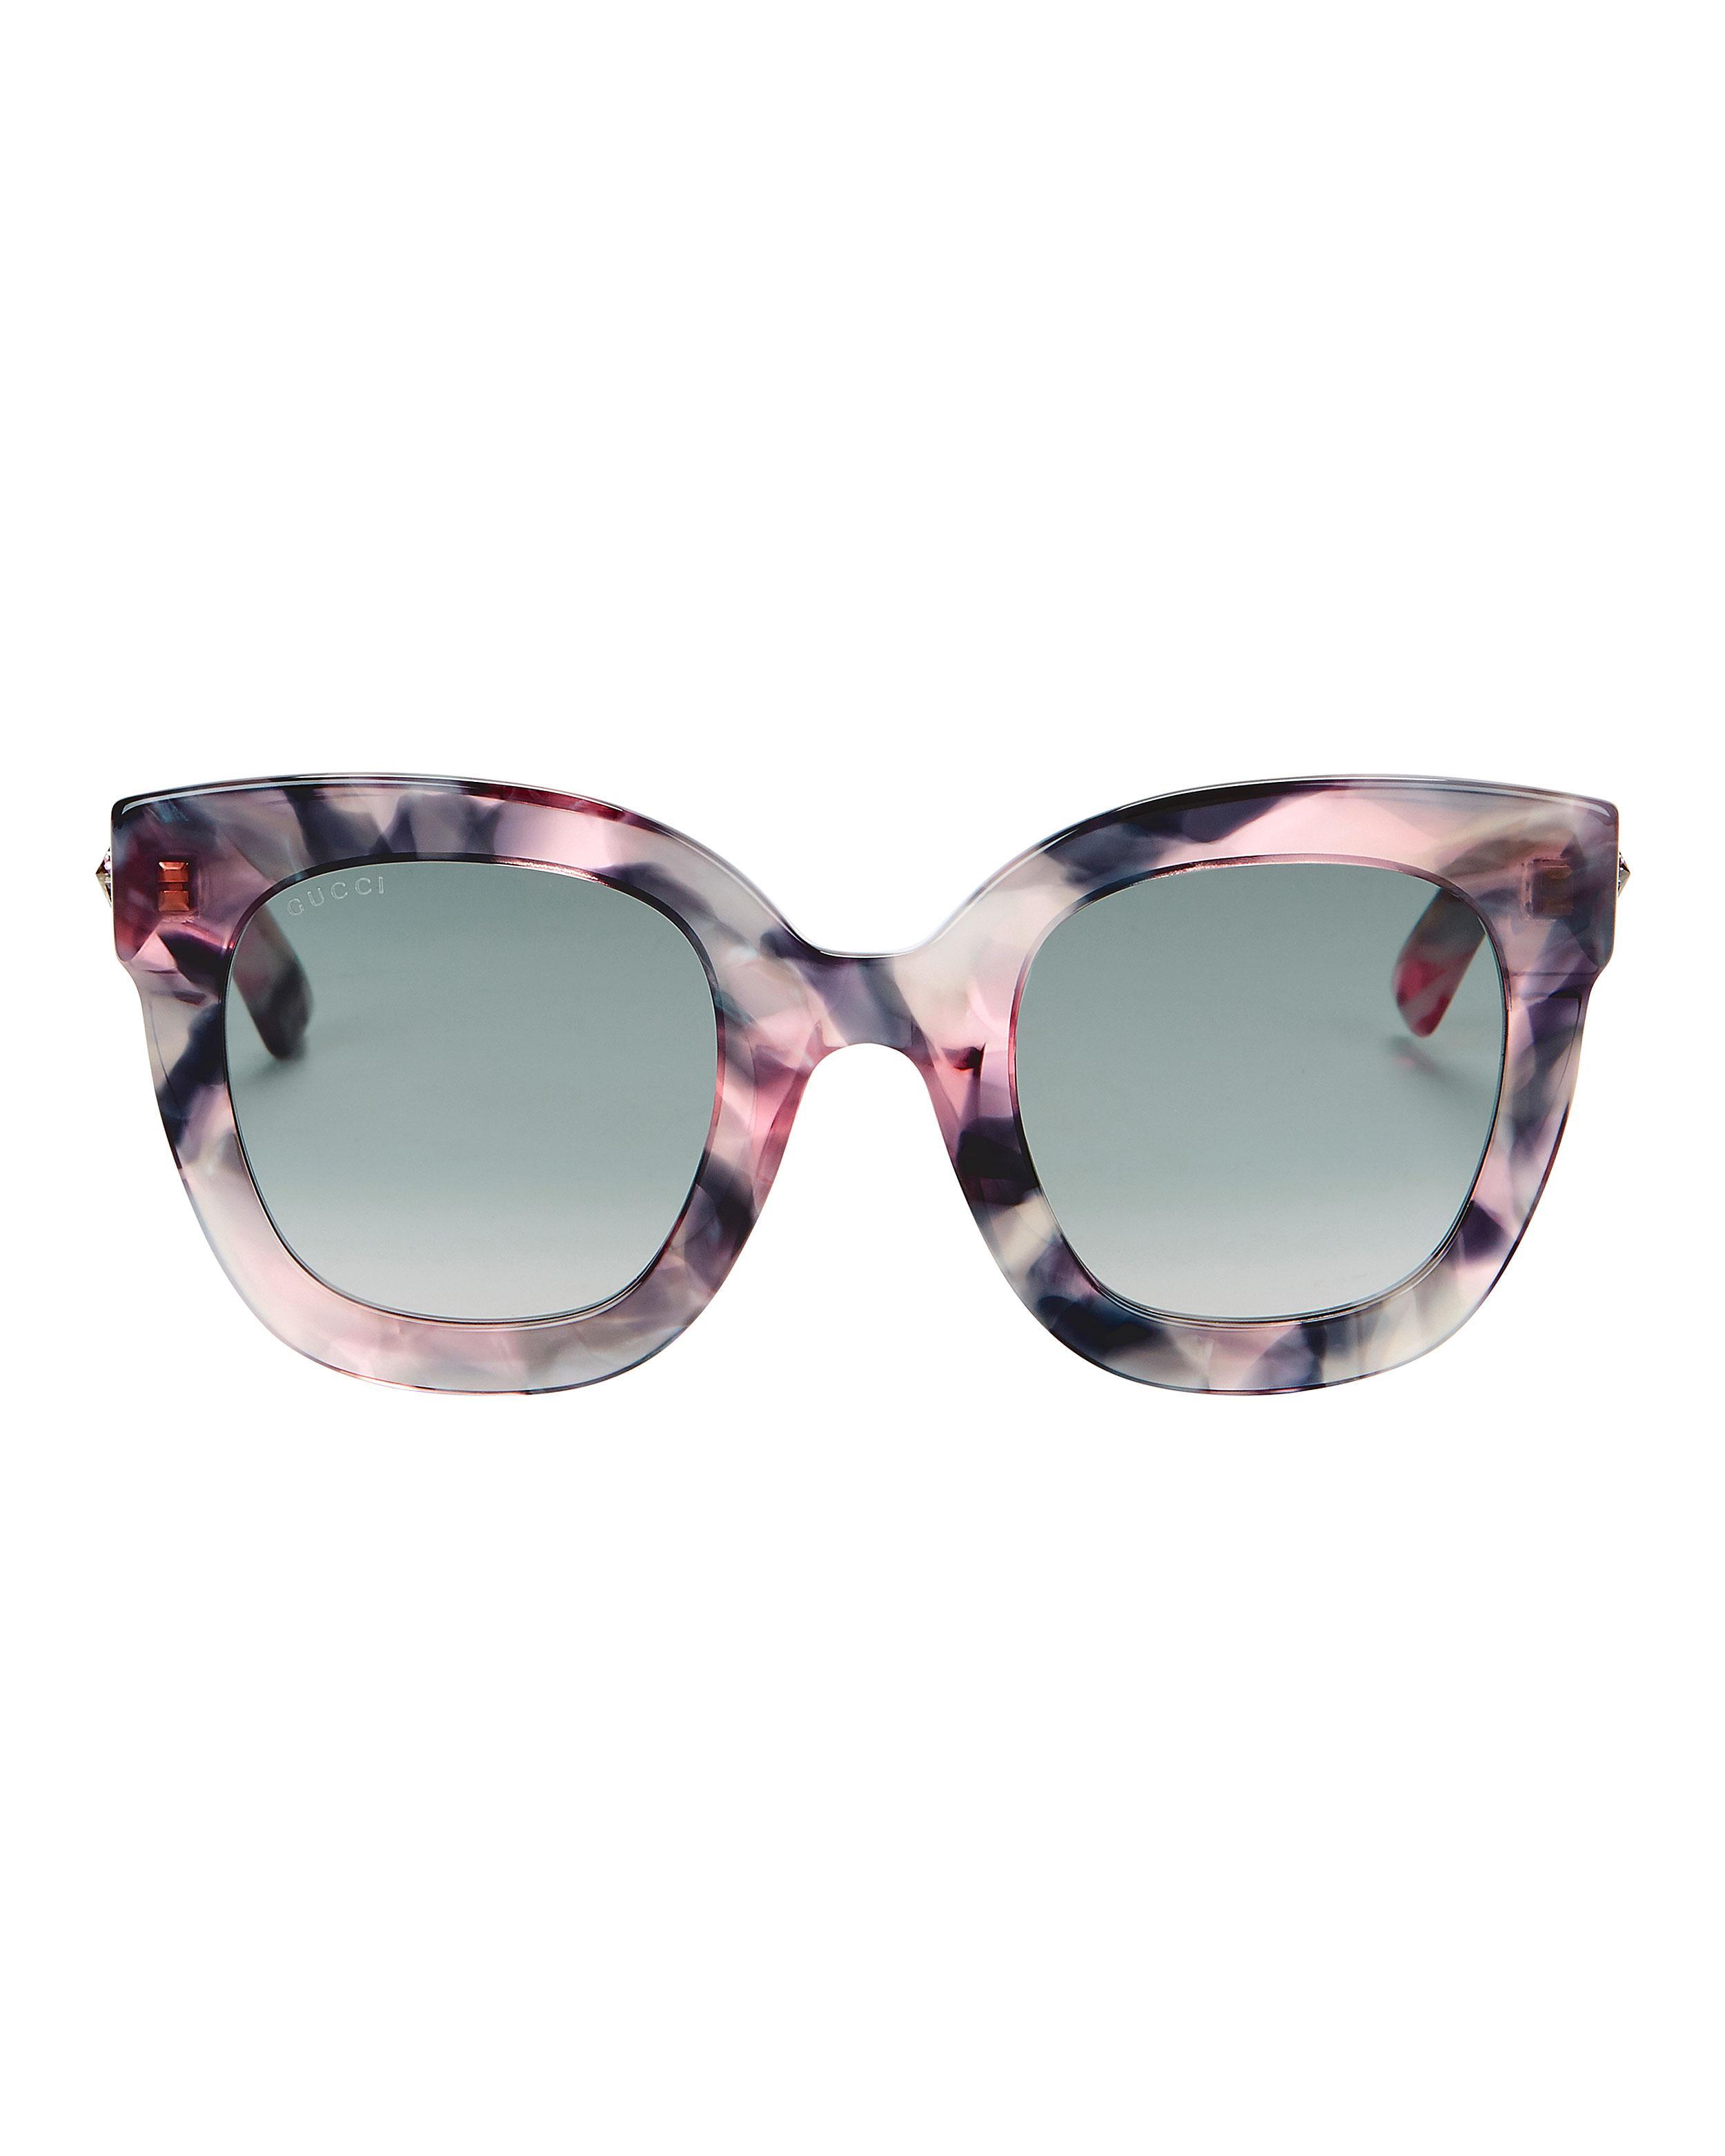 ac2fba80458 Gucci - Multicolor Oversized Marble Acetate Sunglasses - Lyst. View  fullscreen